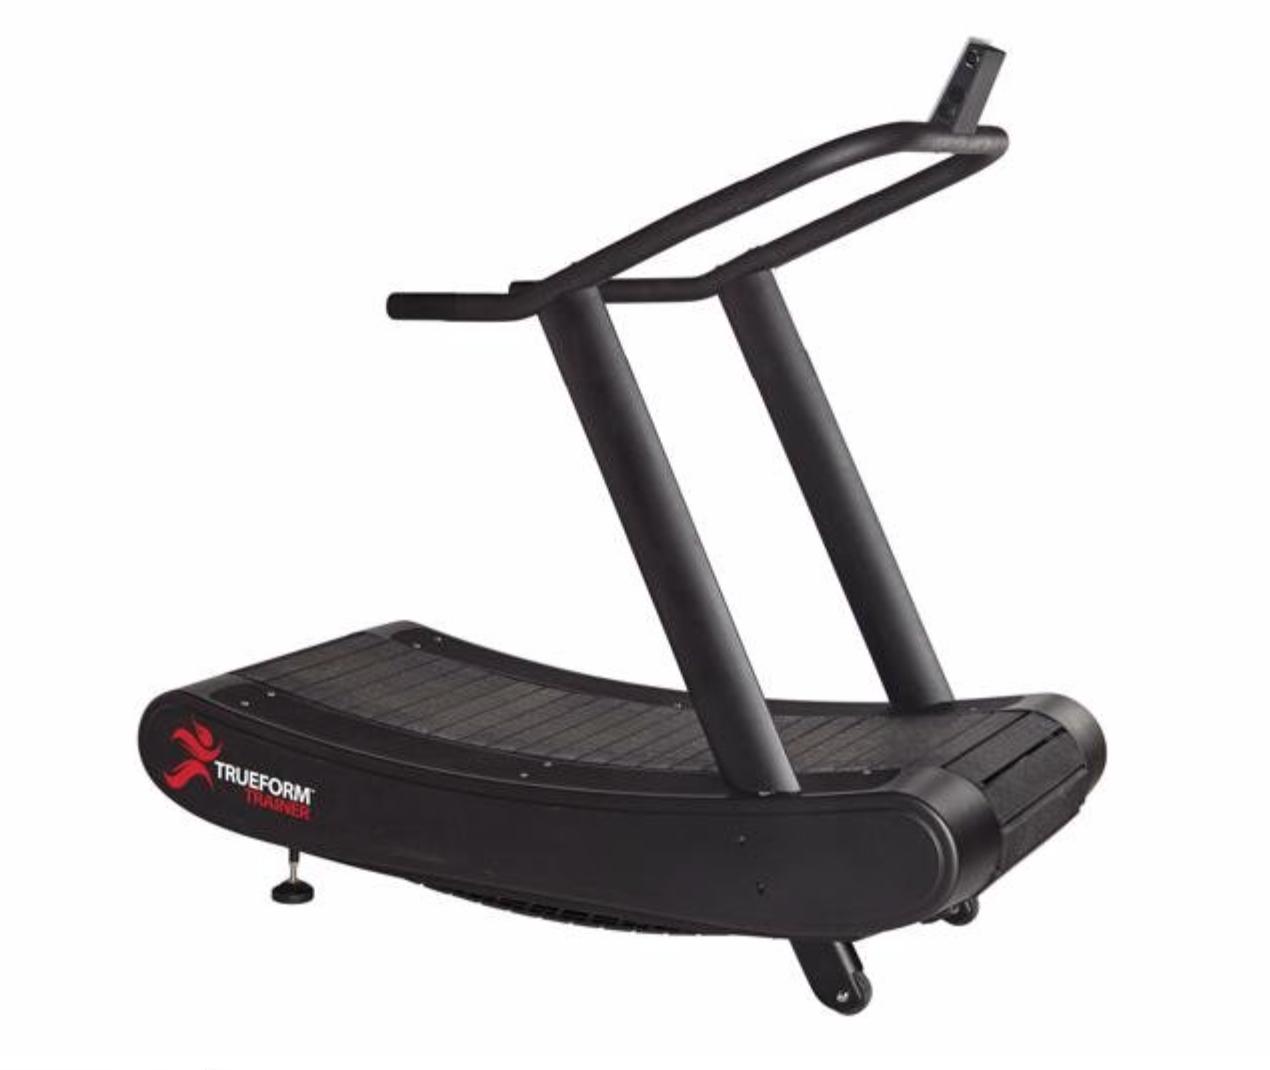 trueform trainer treadmill review